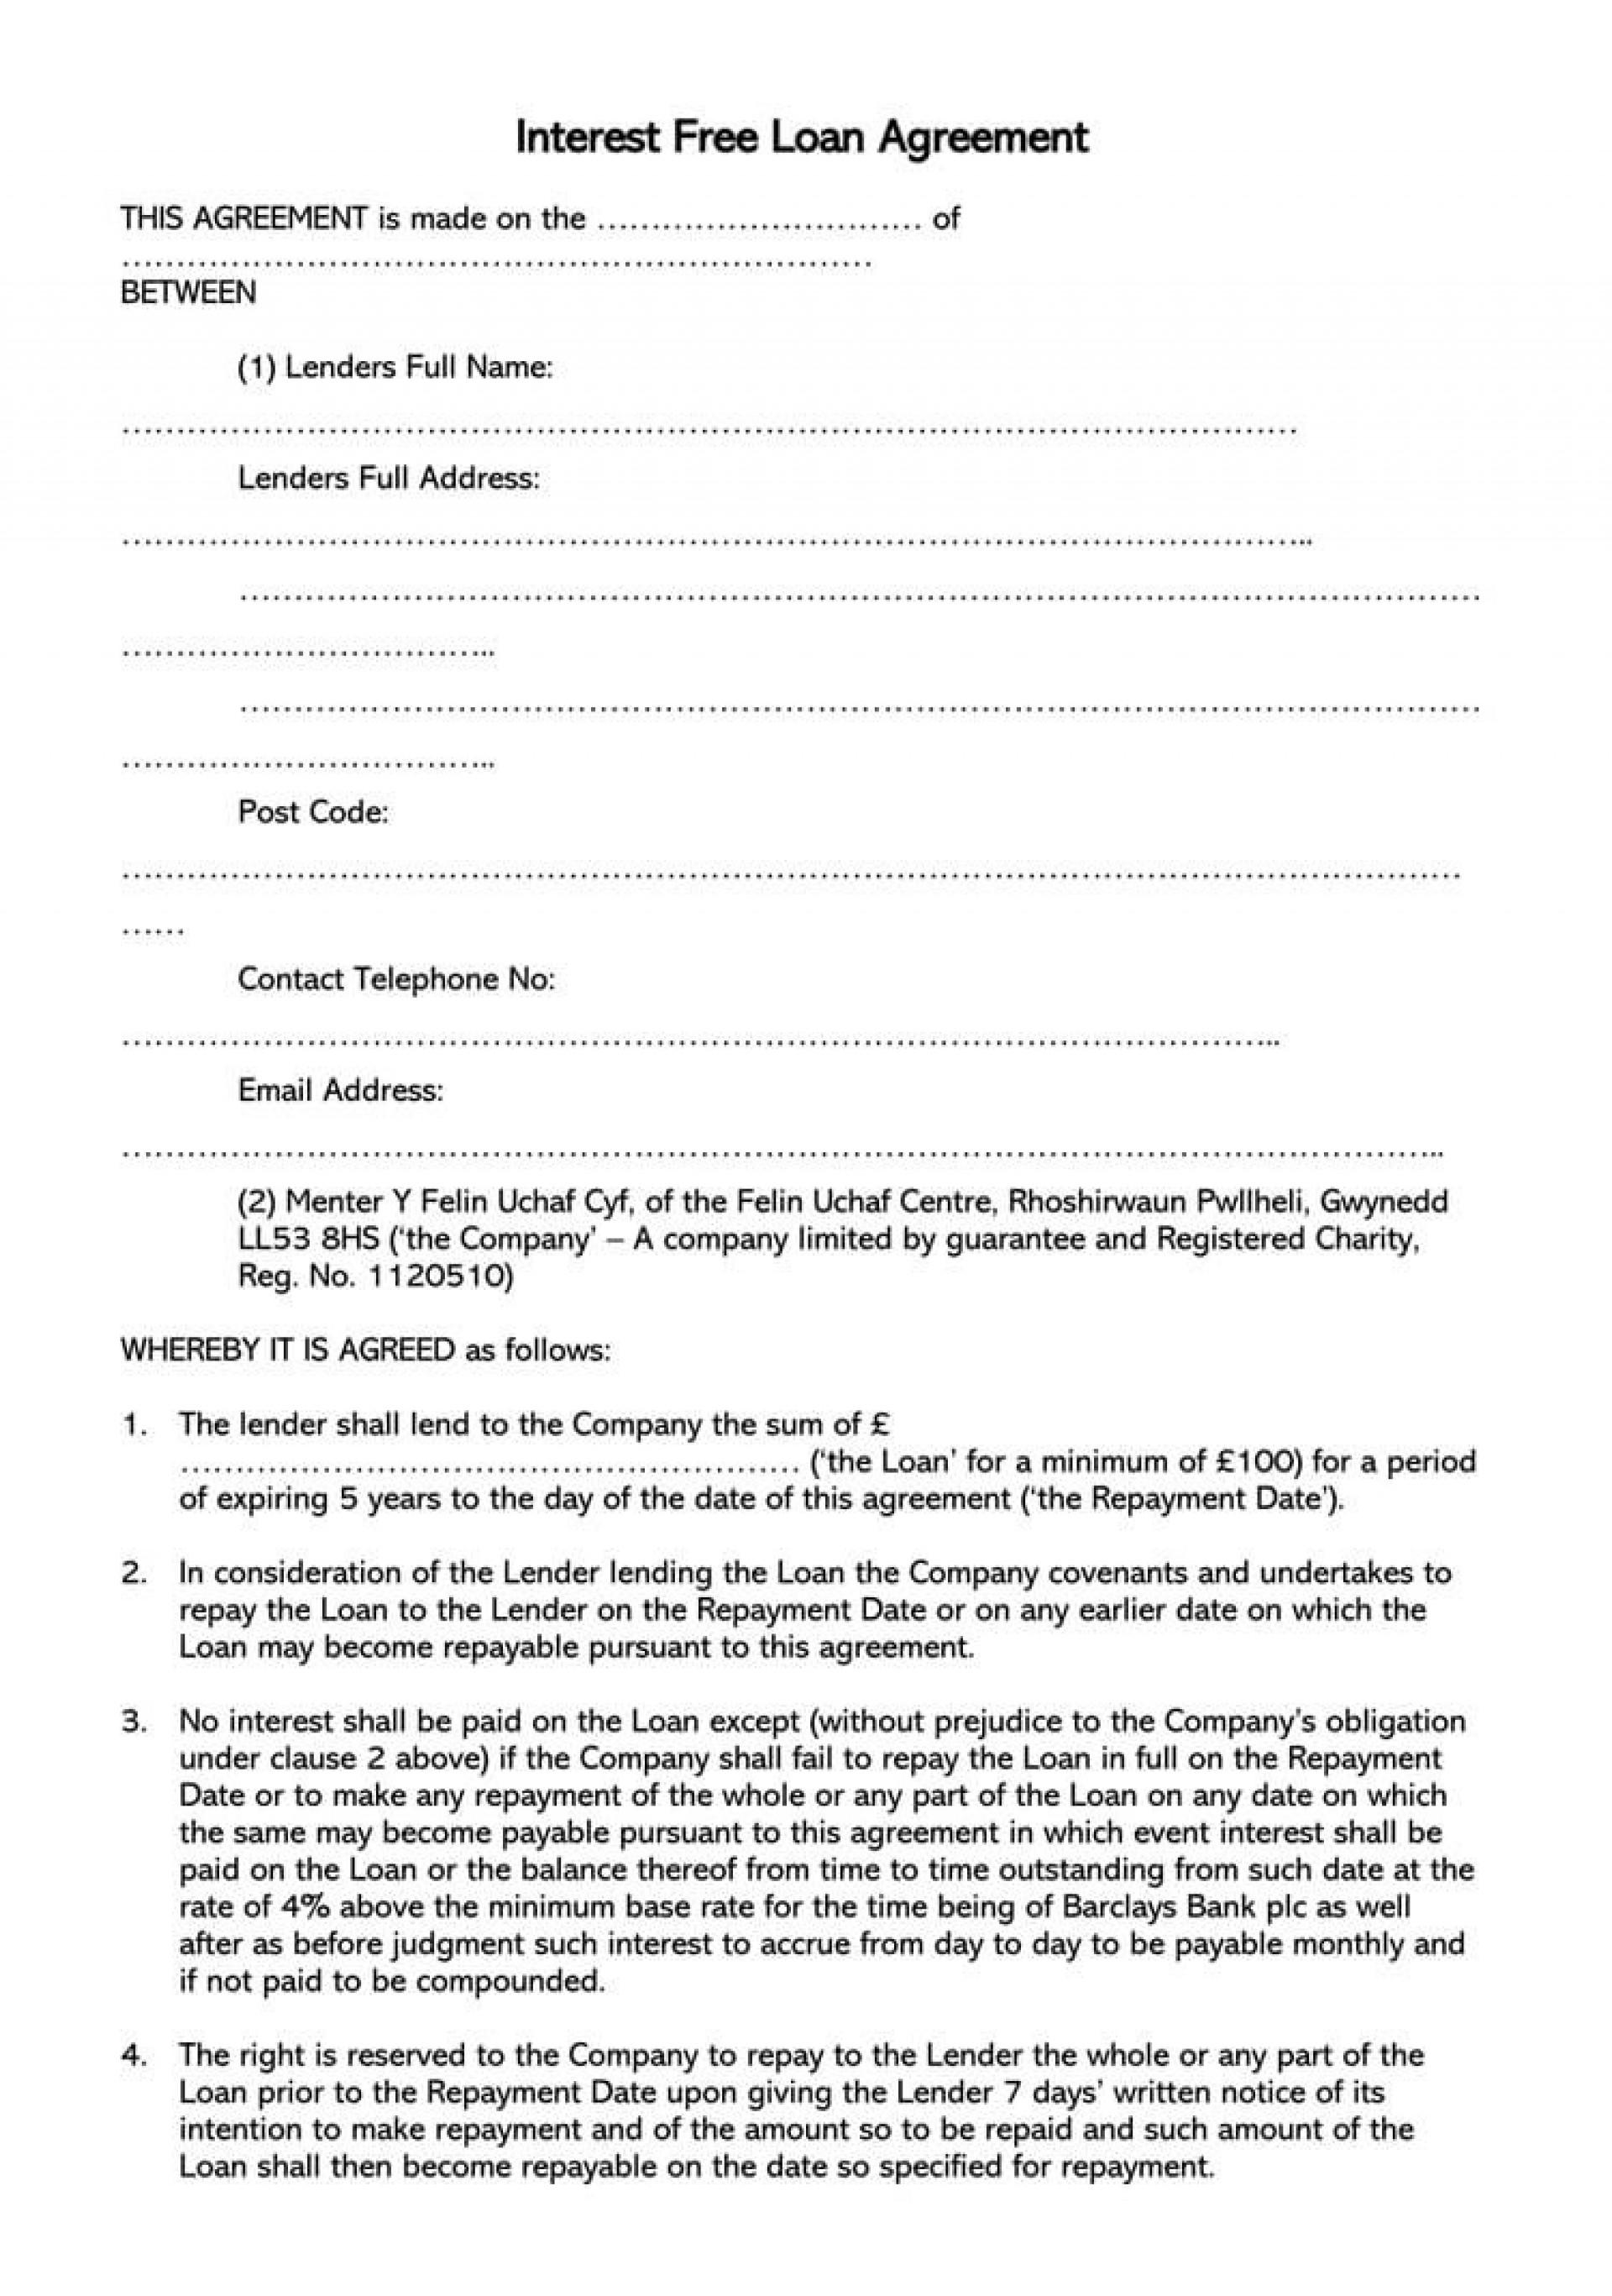 003 Beautiful Loan Agreement Template Free High Def  Word Nz Family Uk1920